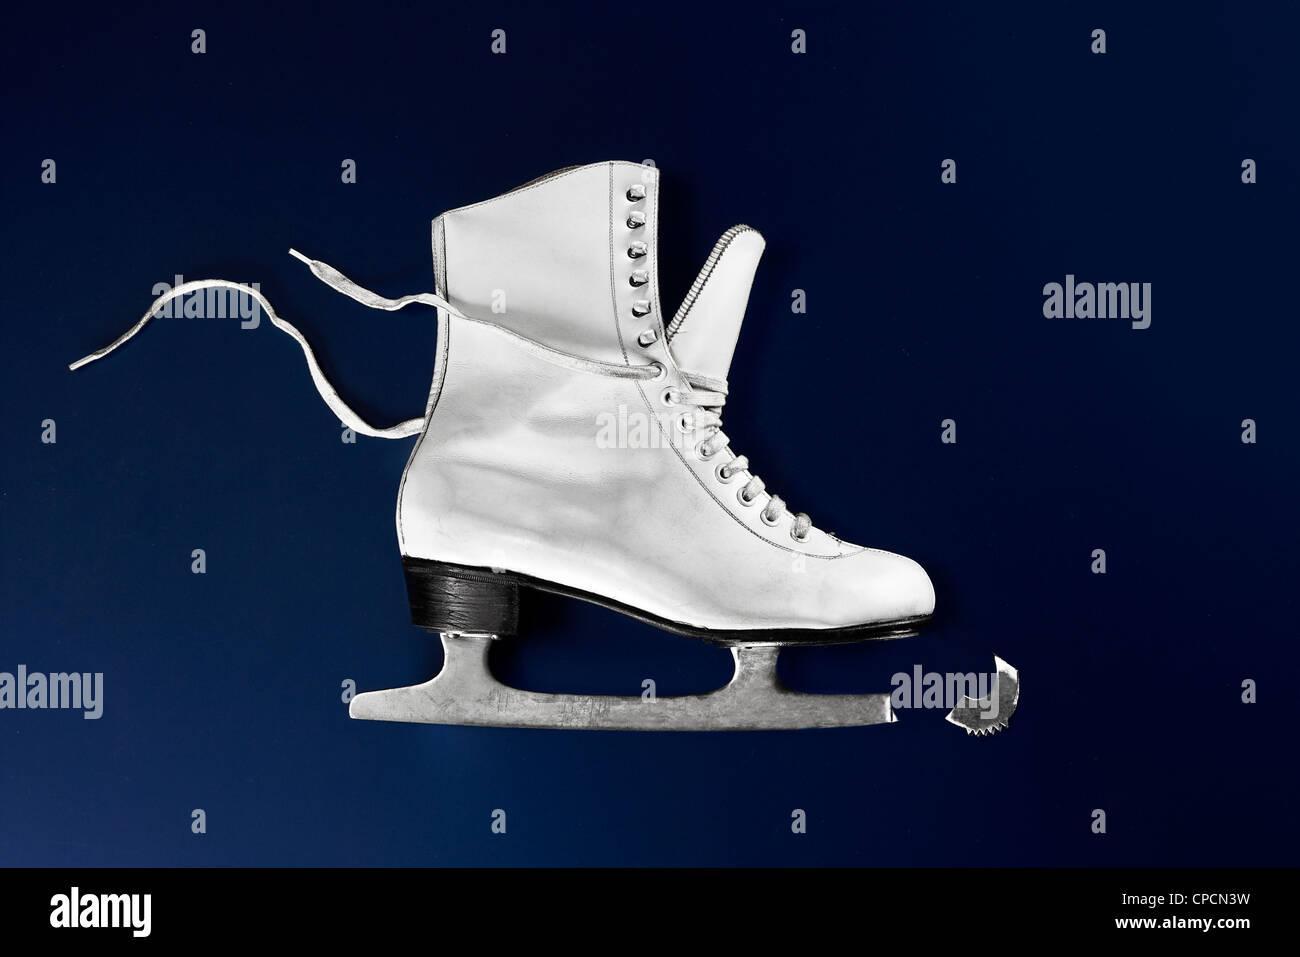 Close up of broken ice skate - Stock Image